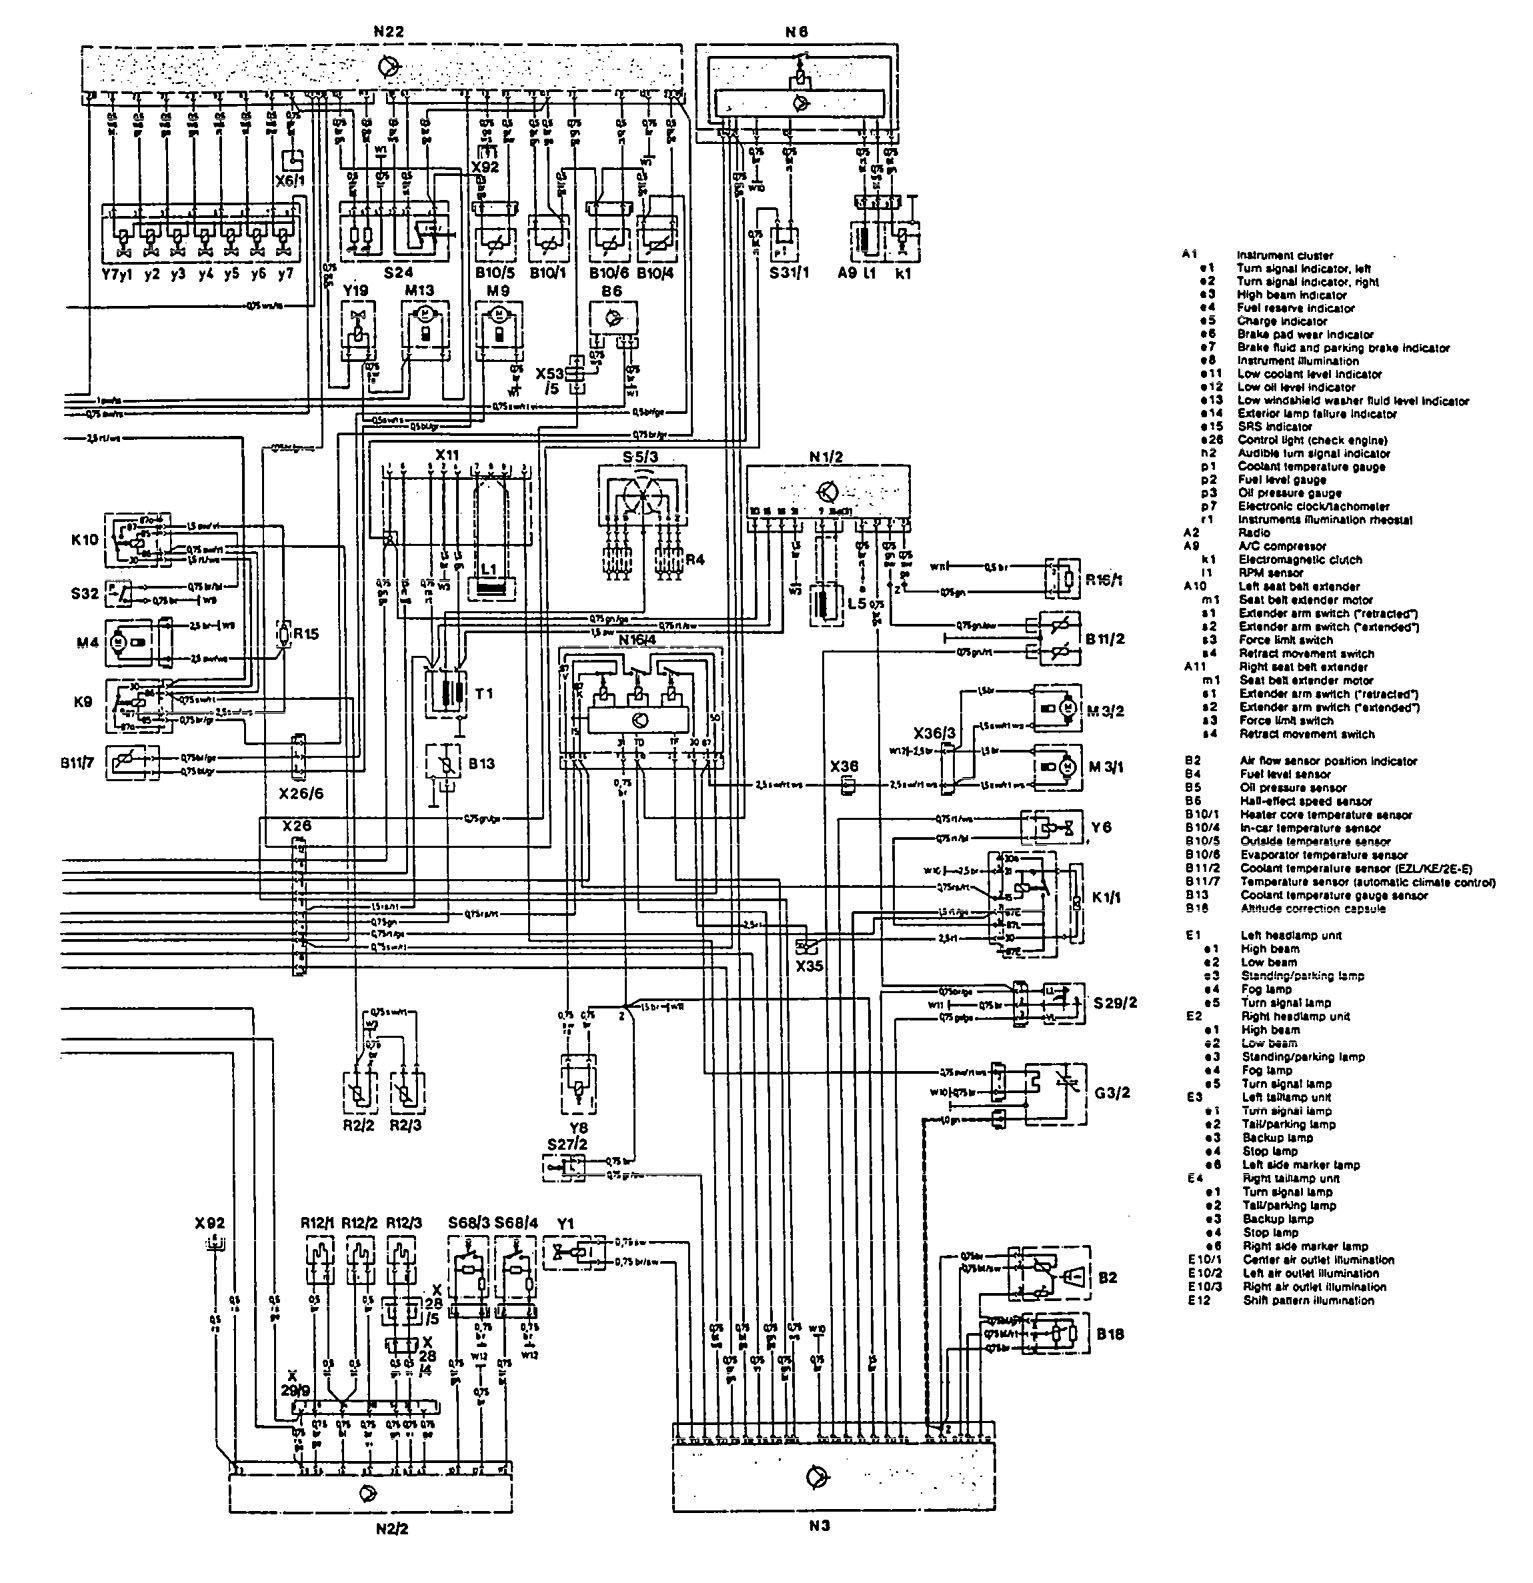 [DIAGRAM_38IS]  TH_5915] Mercedes Benz Lights Wiring Diagram Download Diagram   1992 Mercedes E300 Wiring Diagram      Opogo Basi Bemua Cette Mohammedshrine Librar Wiring 101